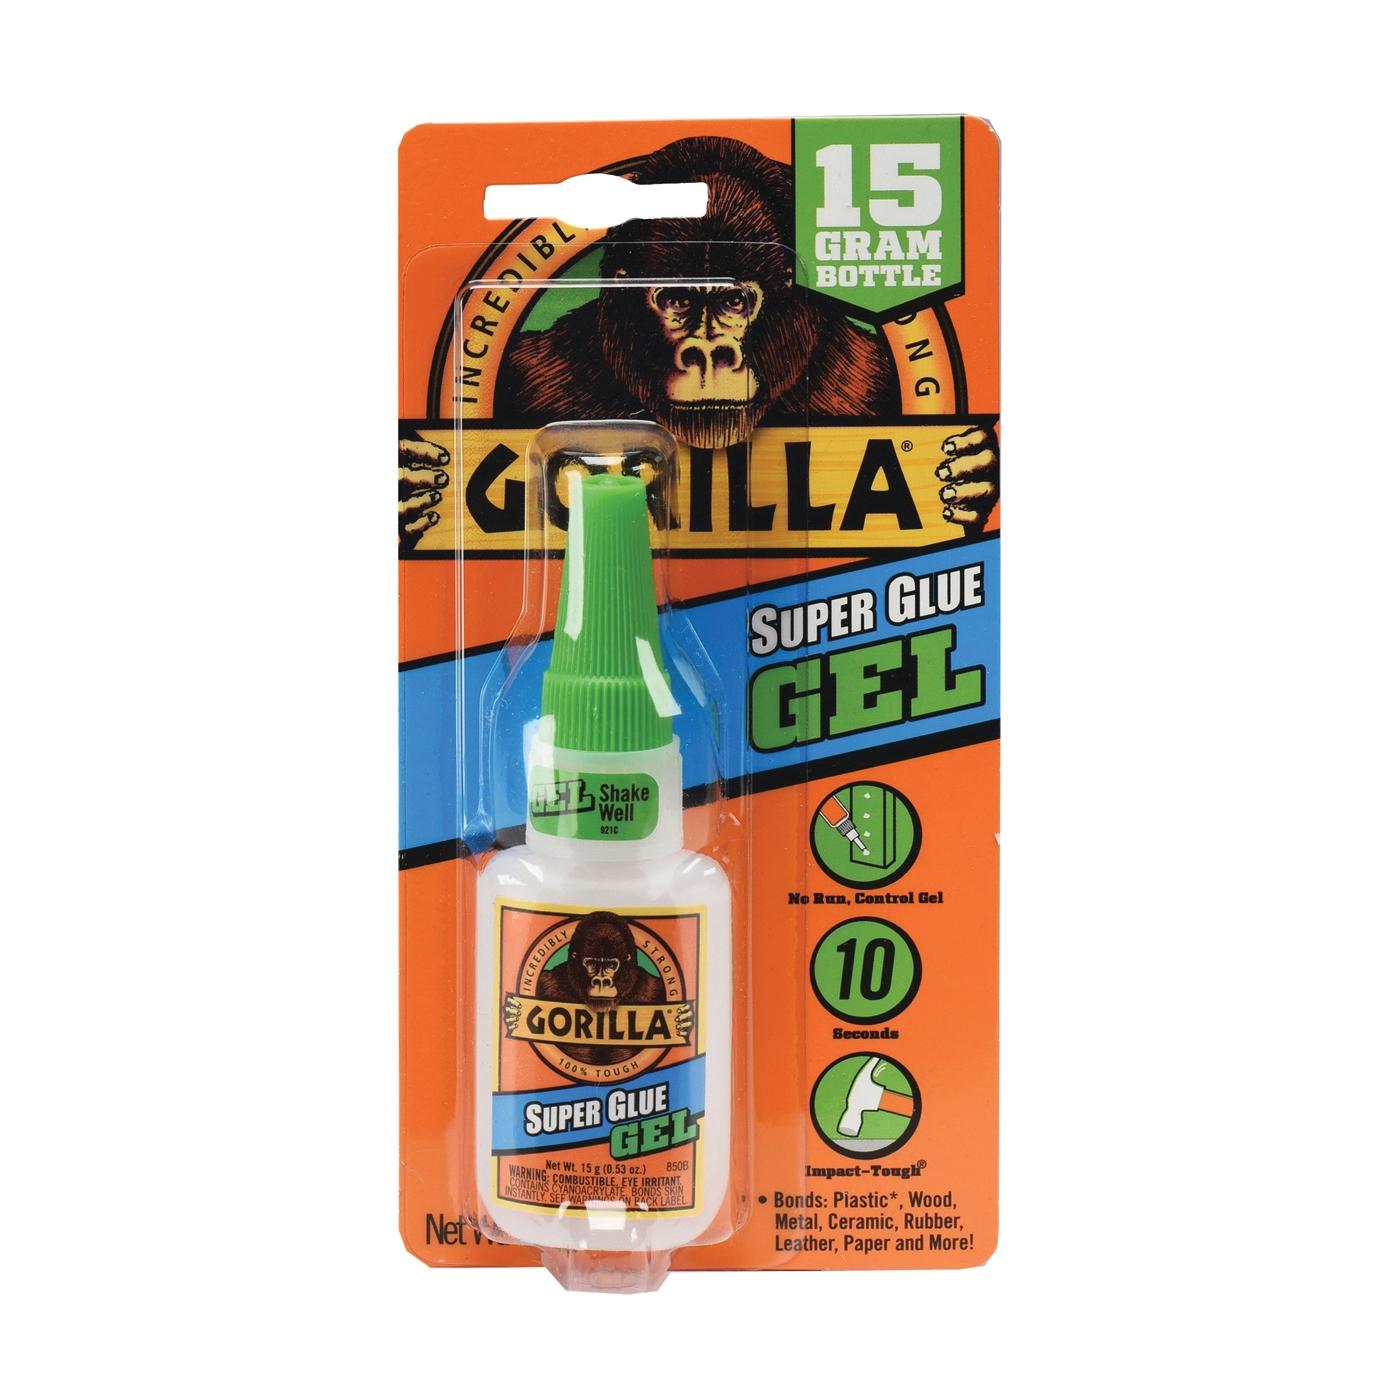 Picture of Gorilla 7600103 Super Glue, Liquid, Irritating, Straw/White Water, 15 g Package, Bottle